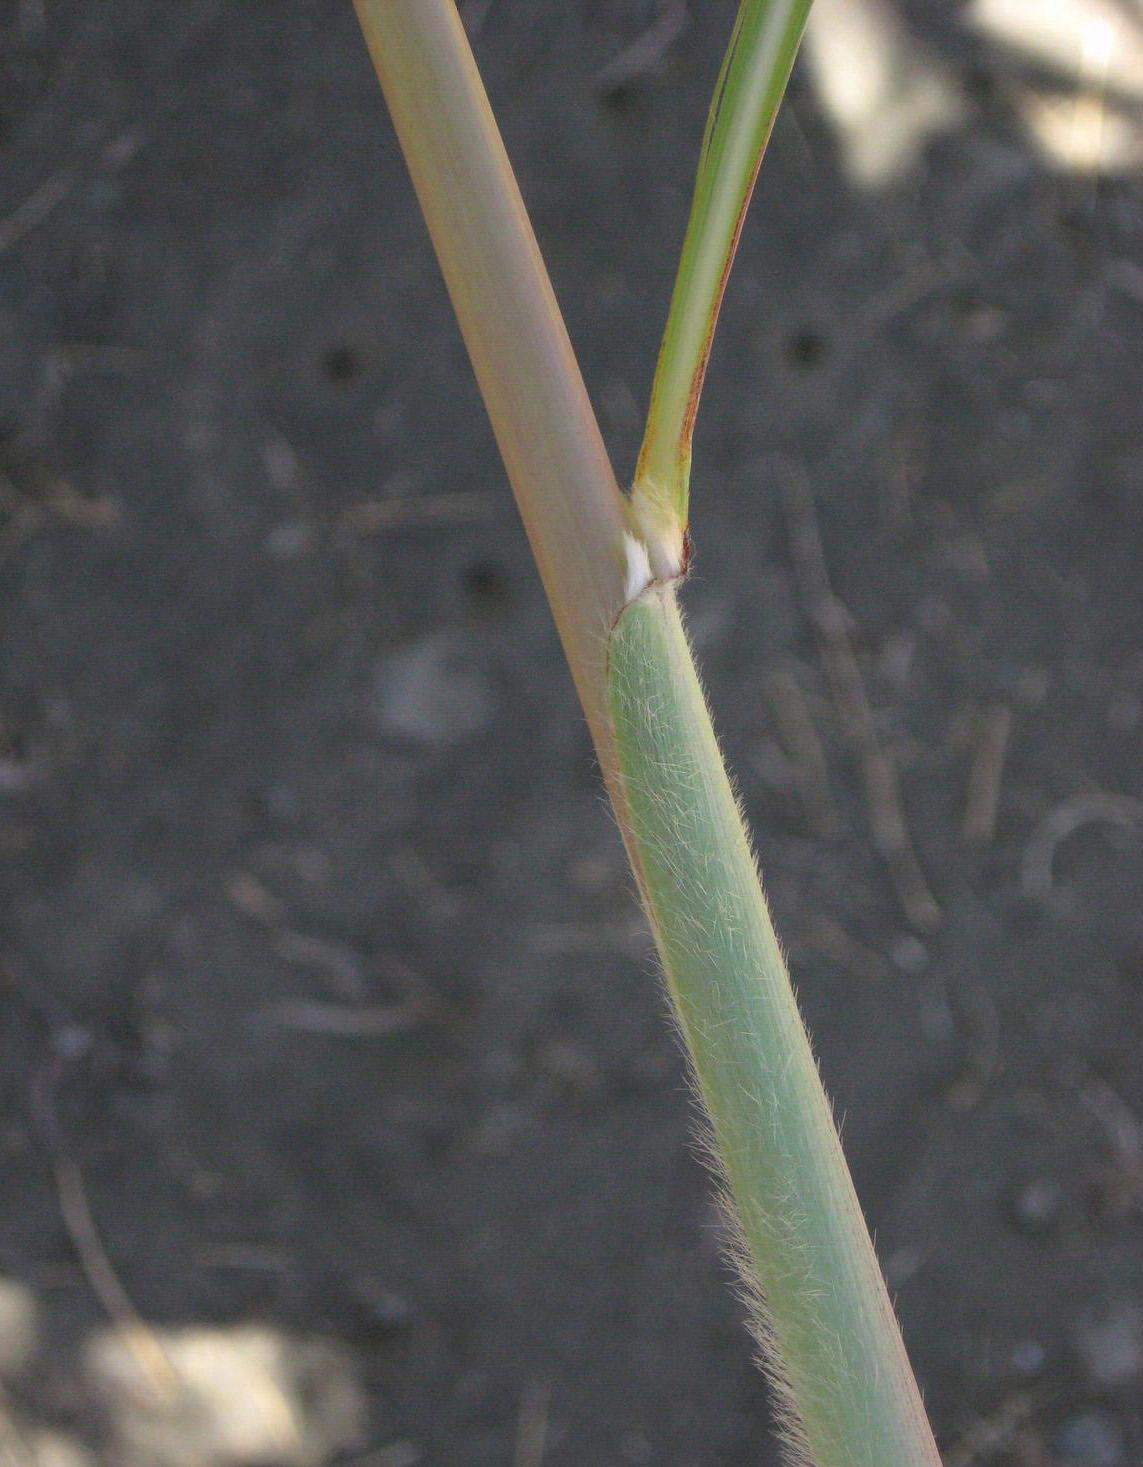 Ravenna grass stem